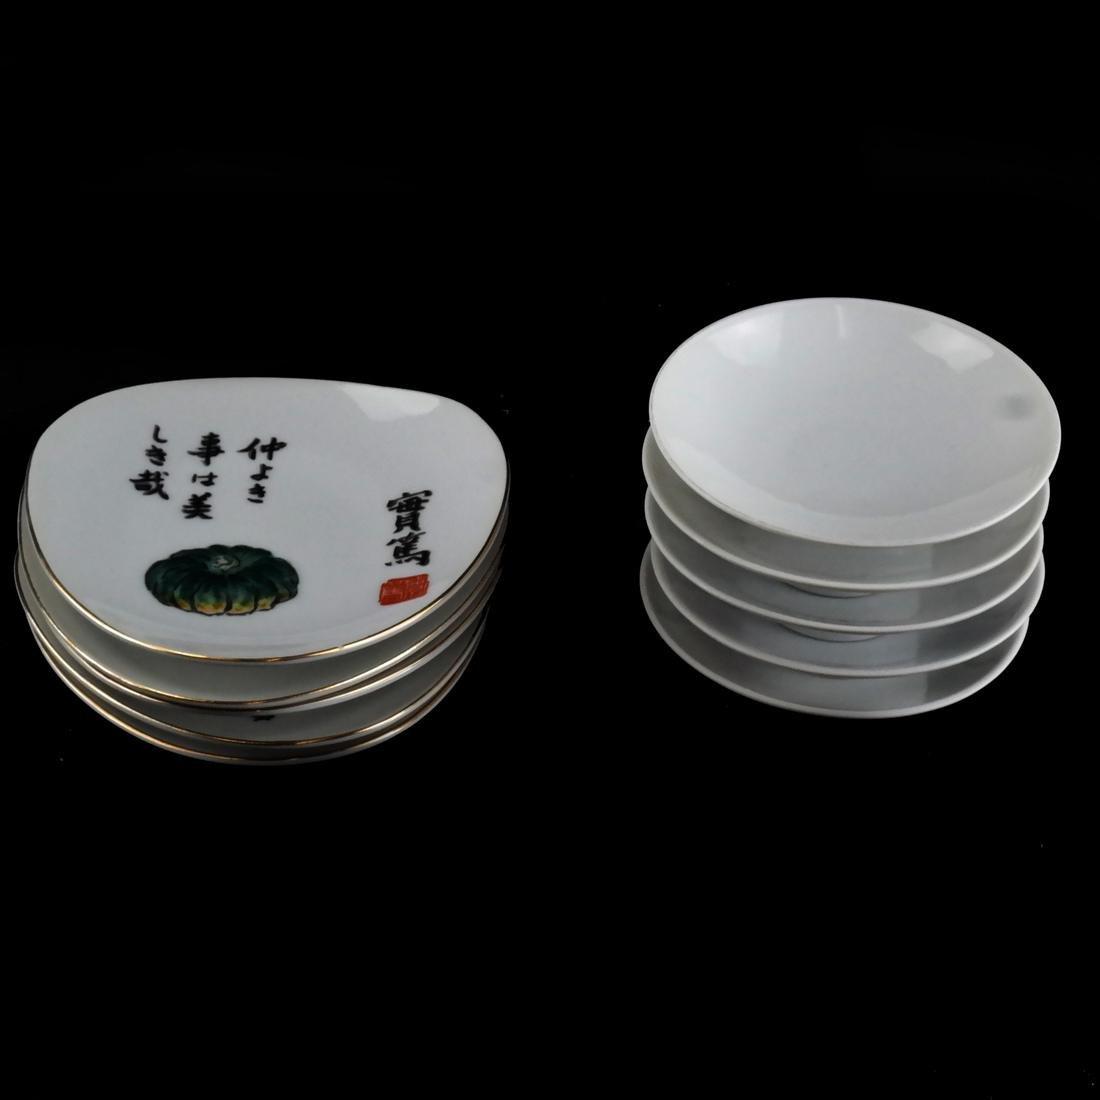 Chinese Seyei Porcelain Luncheon Set - 8